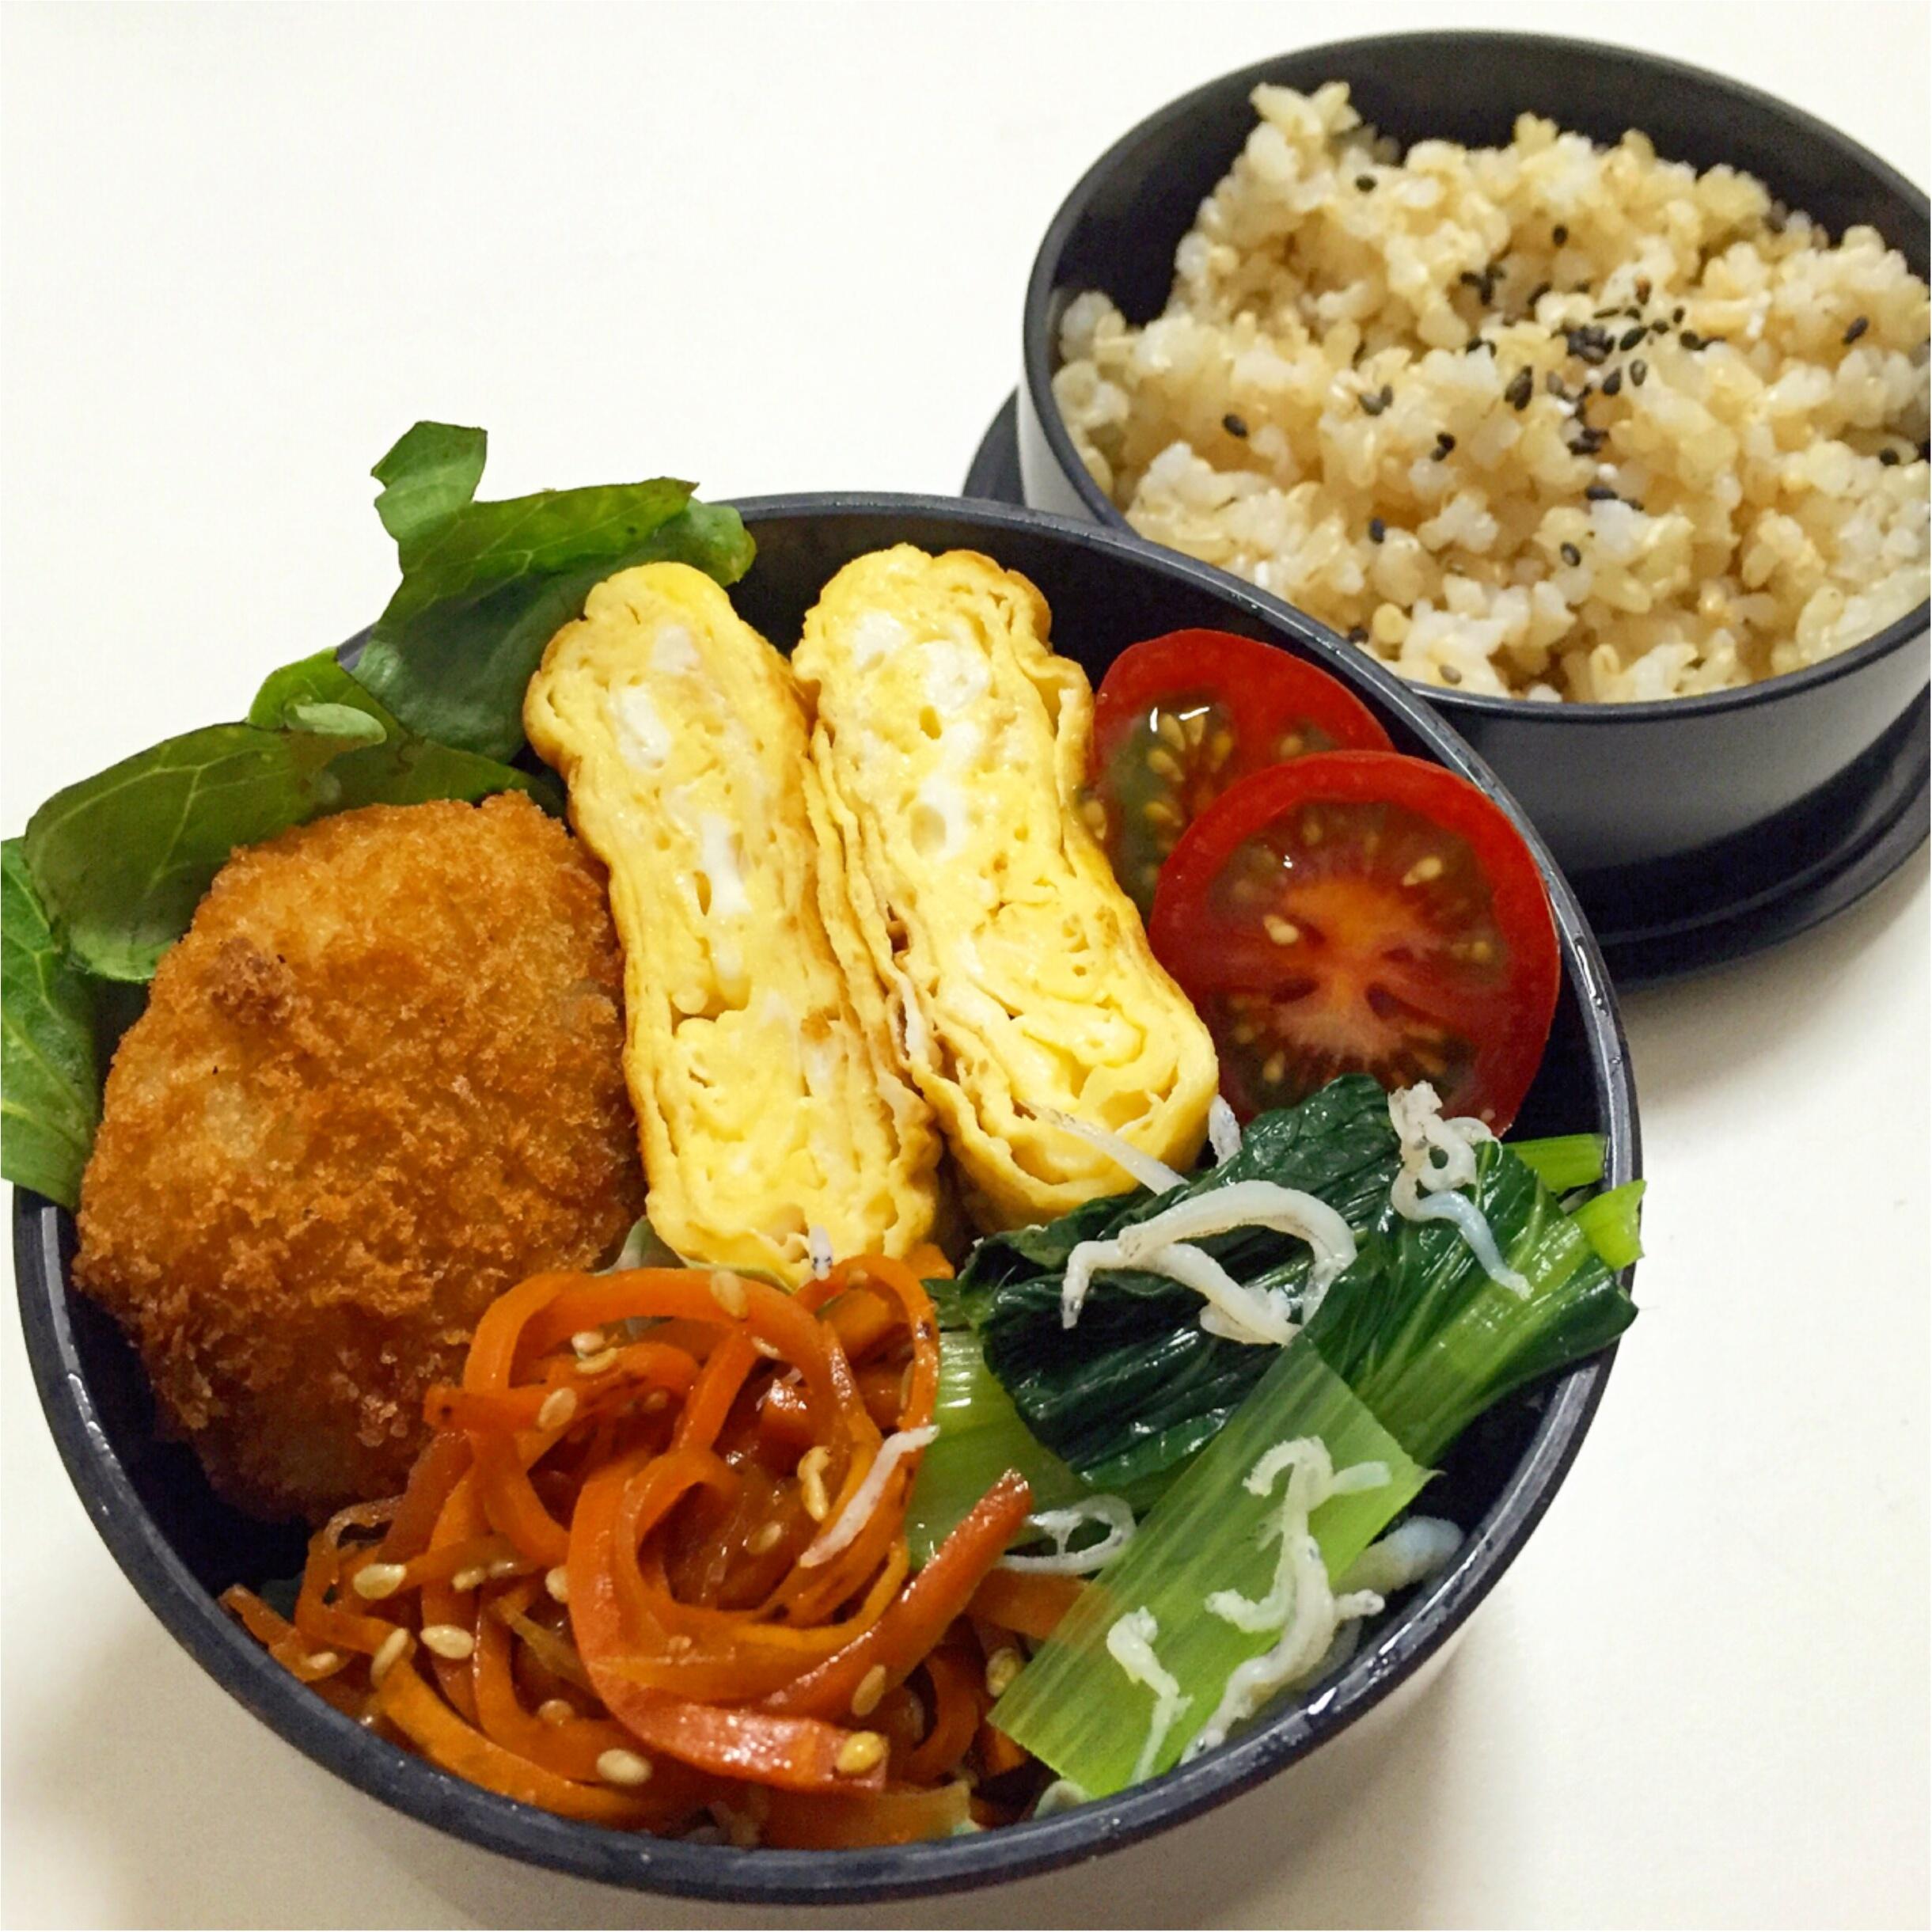 MORE7月号掲載サラダレシピフル活用!1週間の常備菜とお弁当***さっこ_3